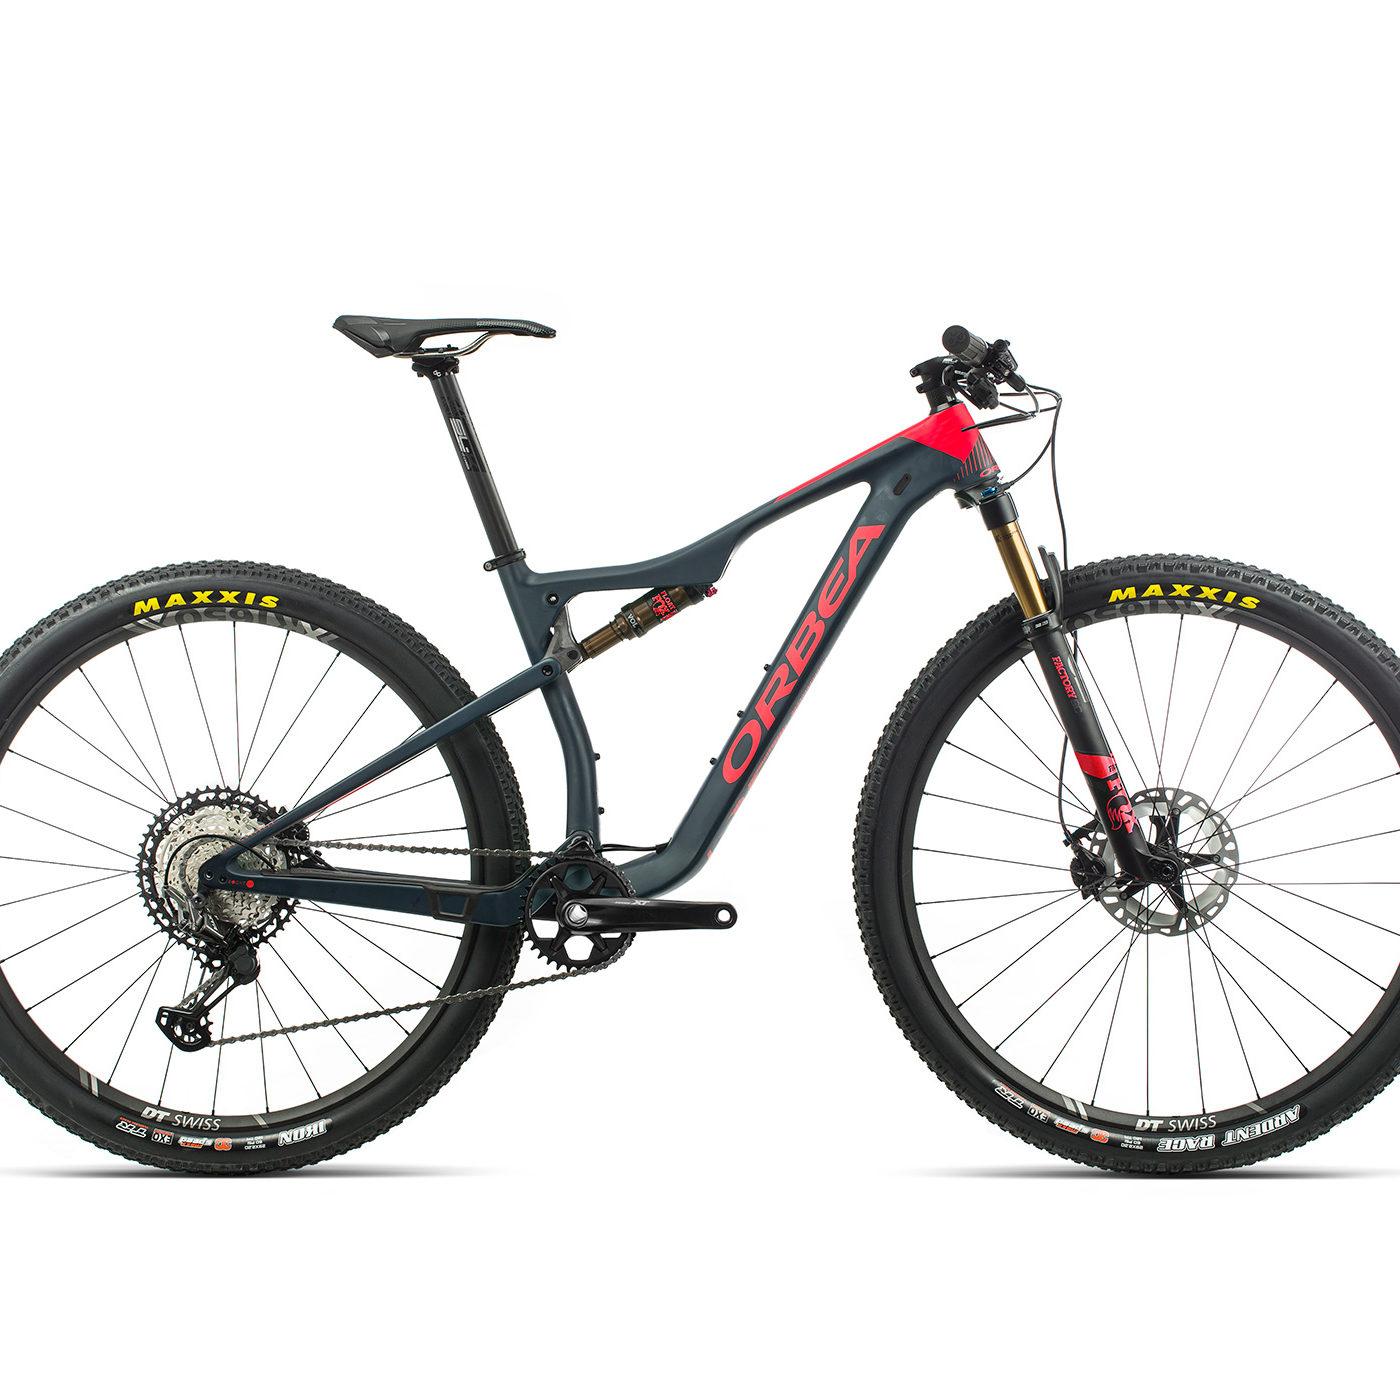 ORBEA OIZ 29 M10 - BLAUW INDIGO/ ZWART (DOF) @G-Bikes